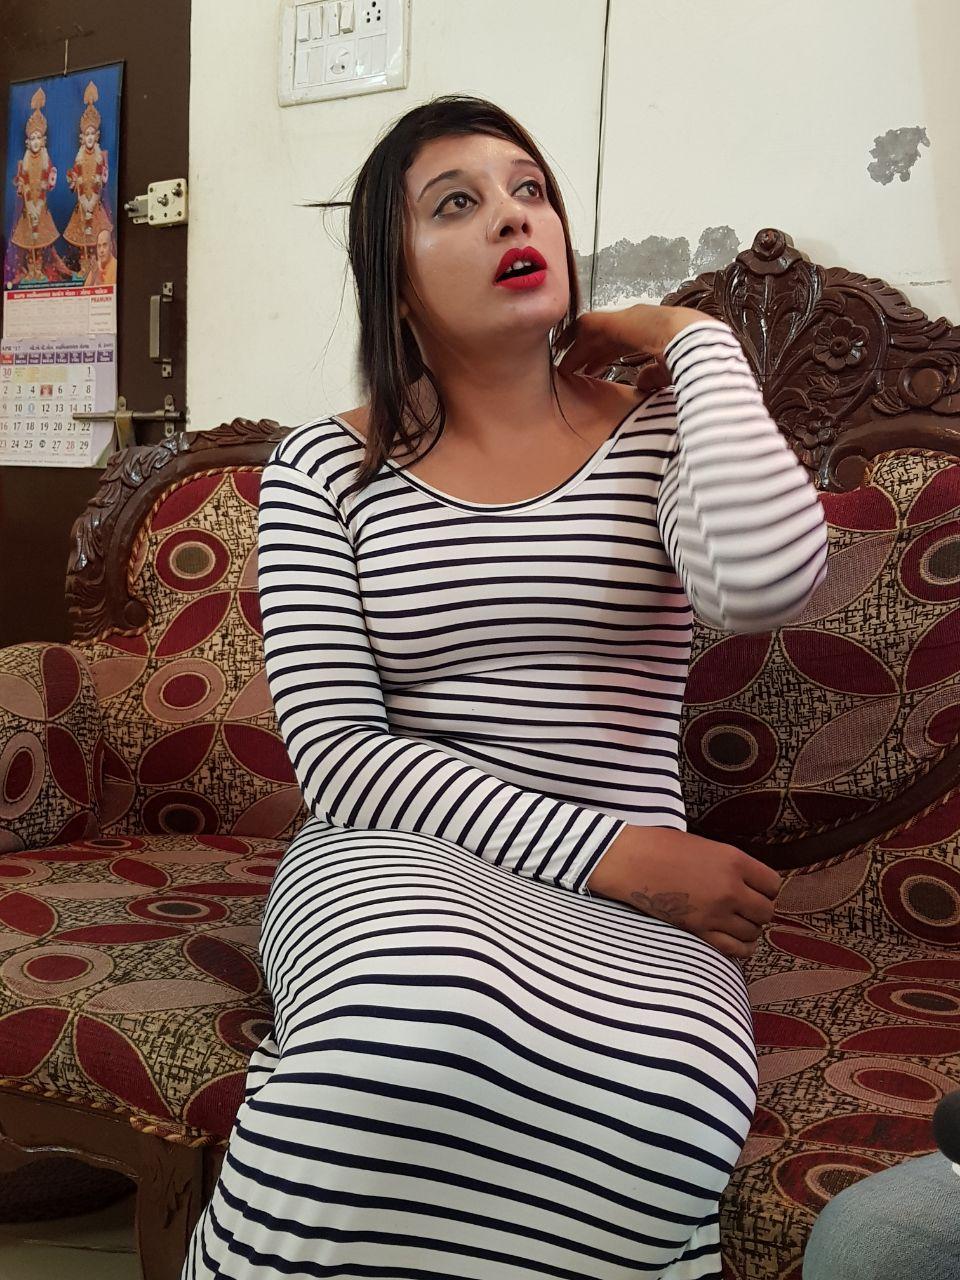 Image result for सिर्फ ट्रांसफीमेल जोया खान